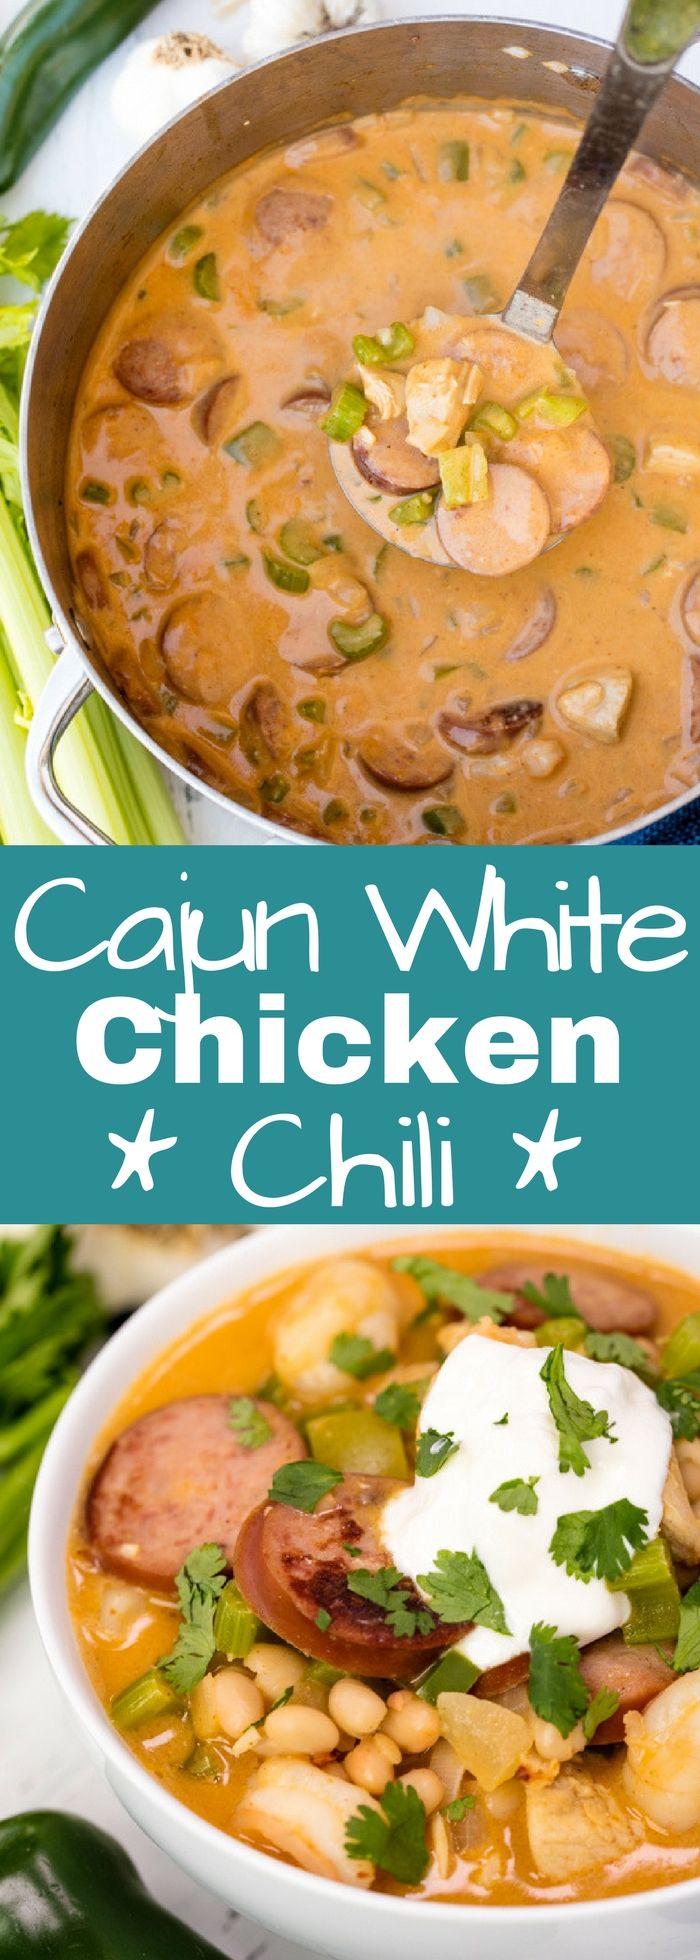 Cajun White Chicken Chili #cajunandcreolerecipes